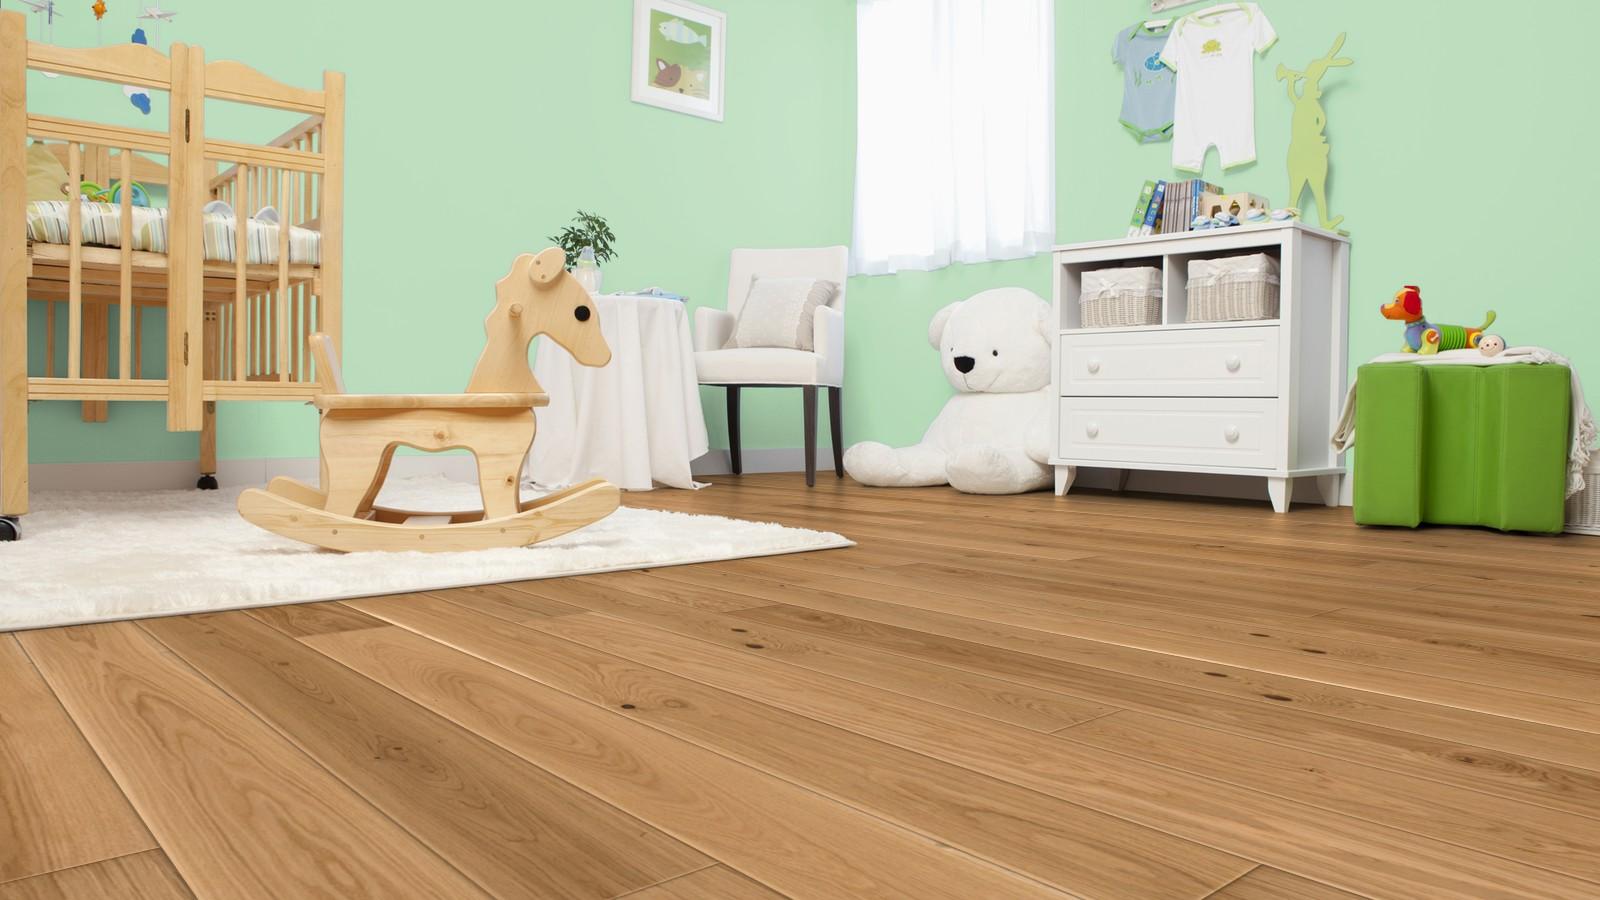 ter h rne bright collection l parkett l b19 eiche l landhausdiele preisbrecher 24 gmbh. Black Bedroom Furniture Sets. Home Design Ideas